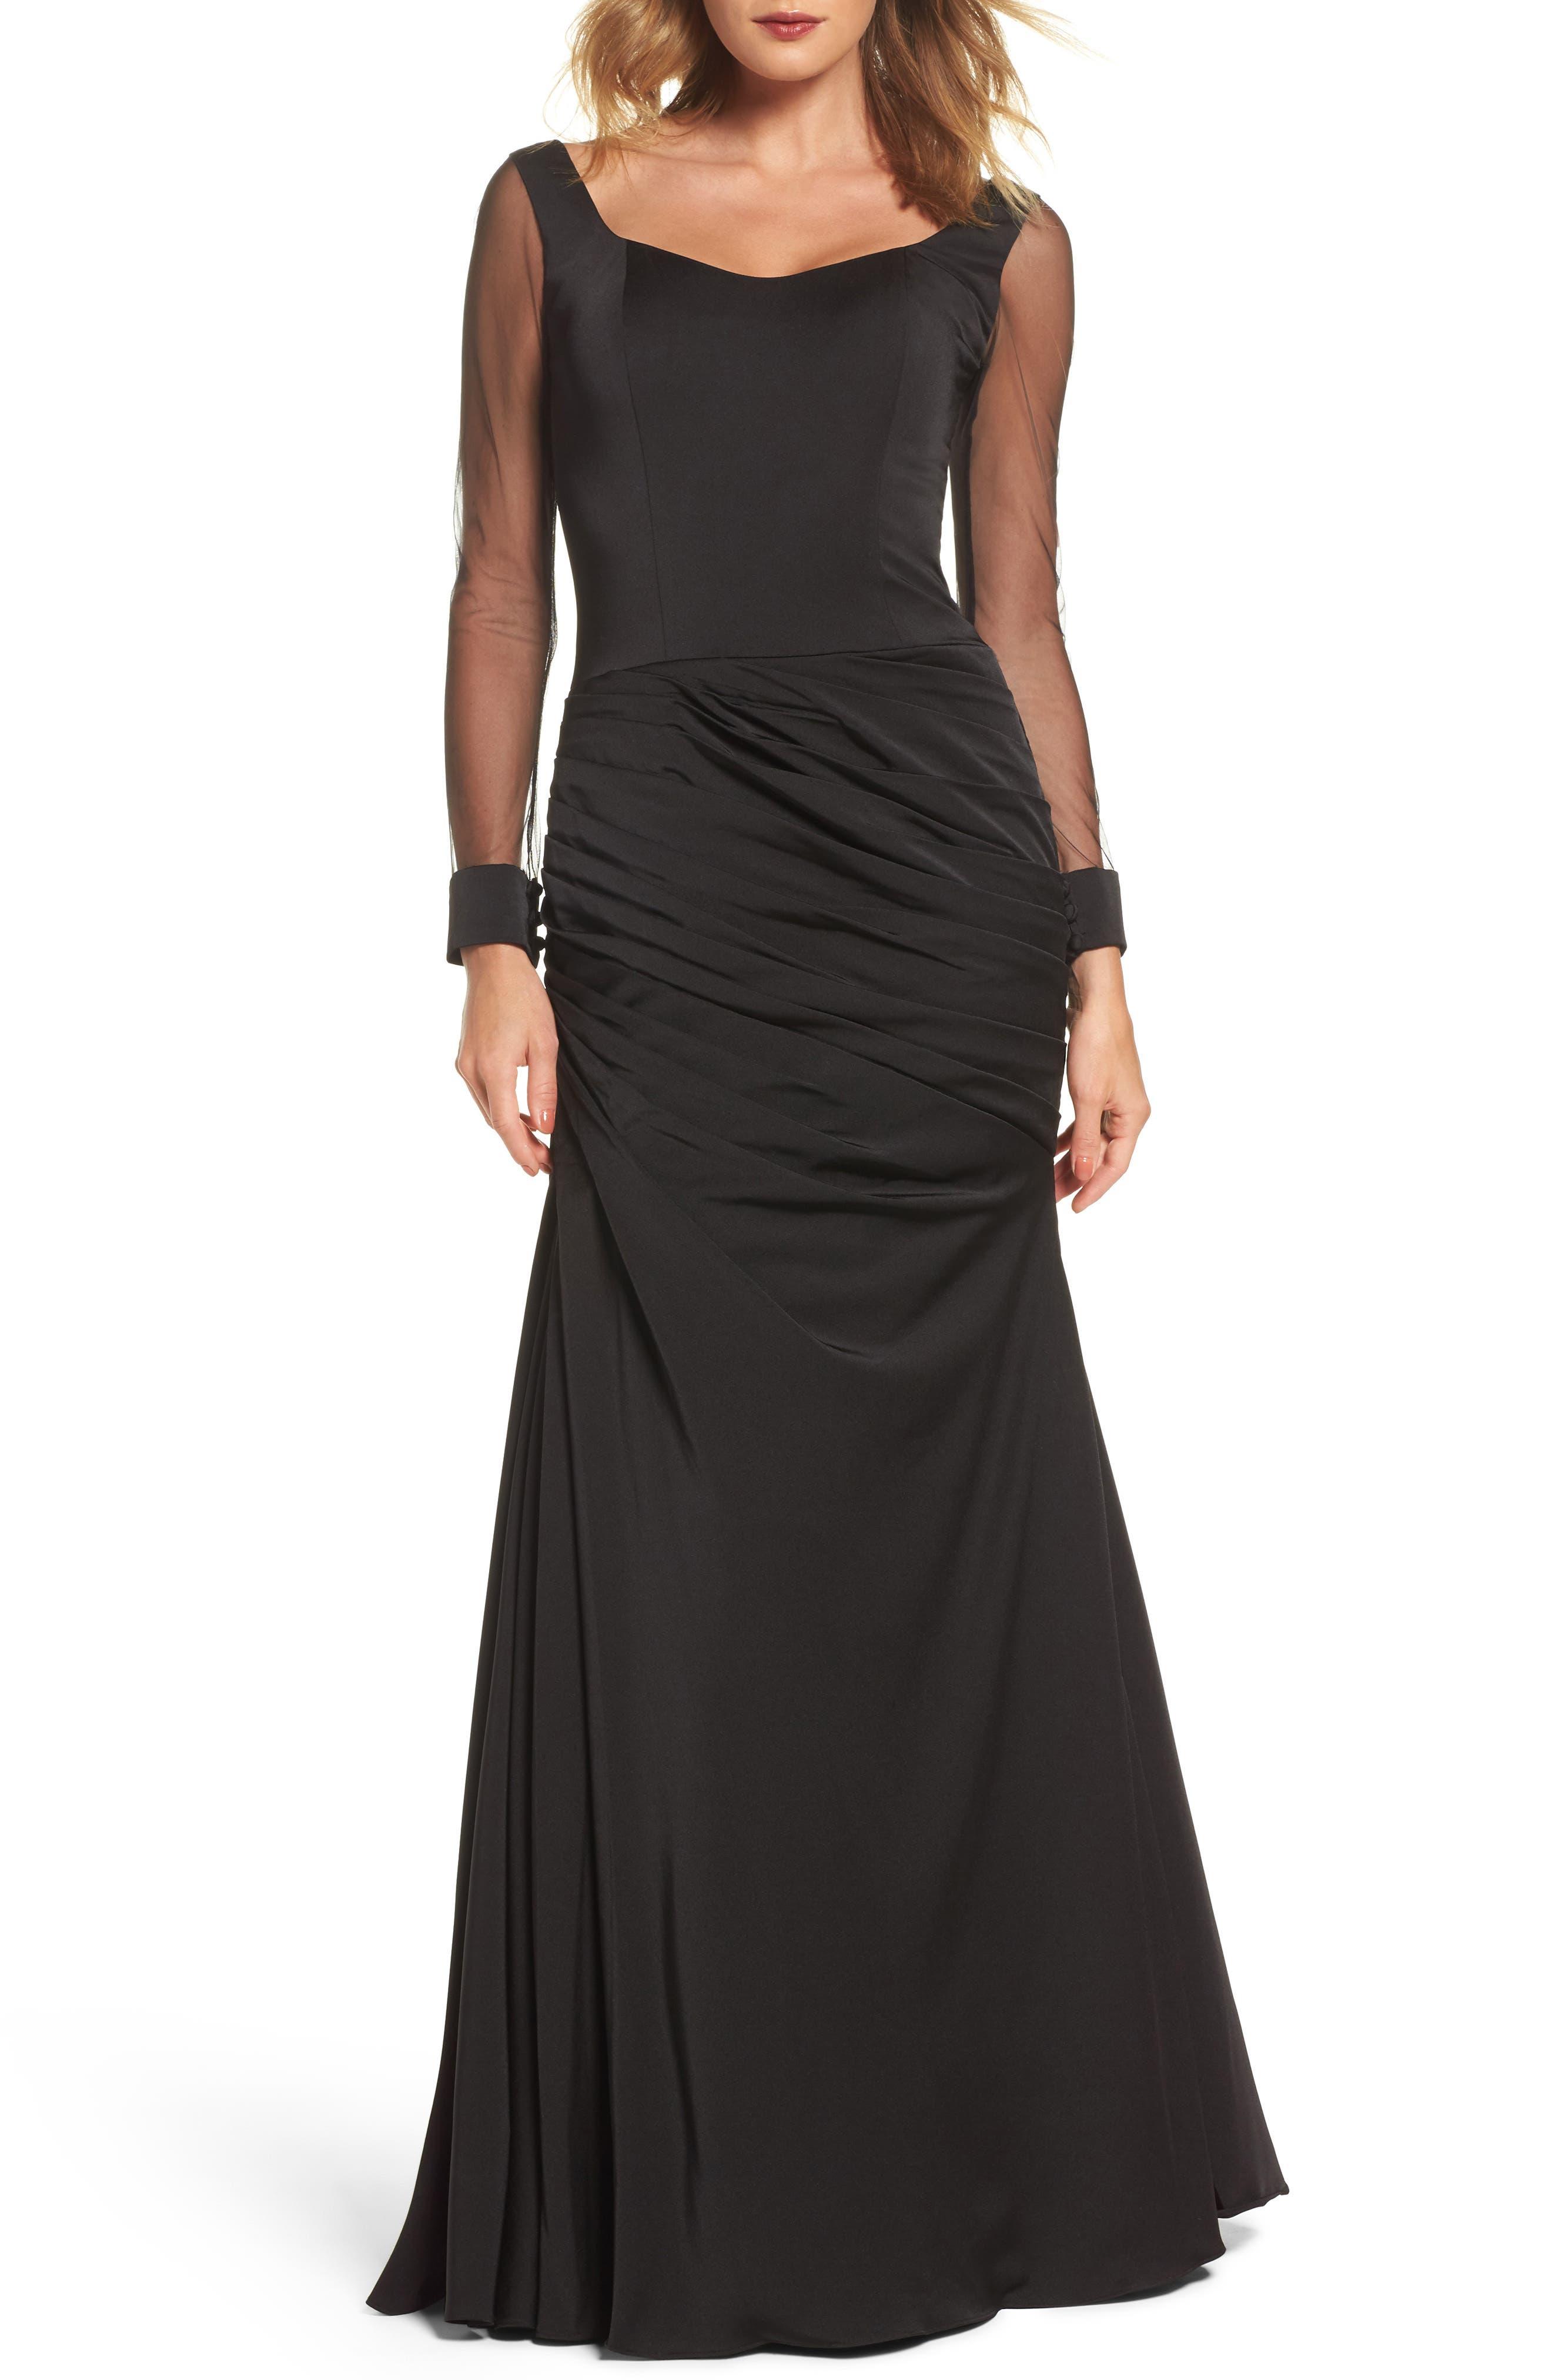 LA FEMME Sheer Sleeve Gown, Main, color, BLACK